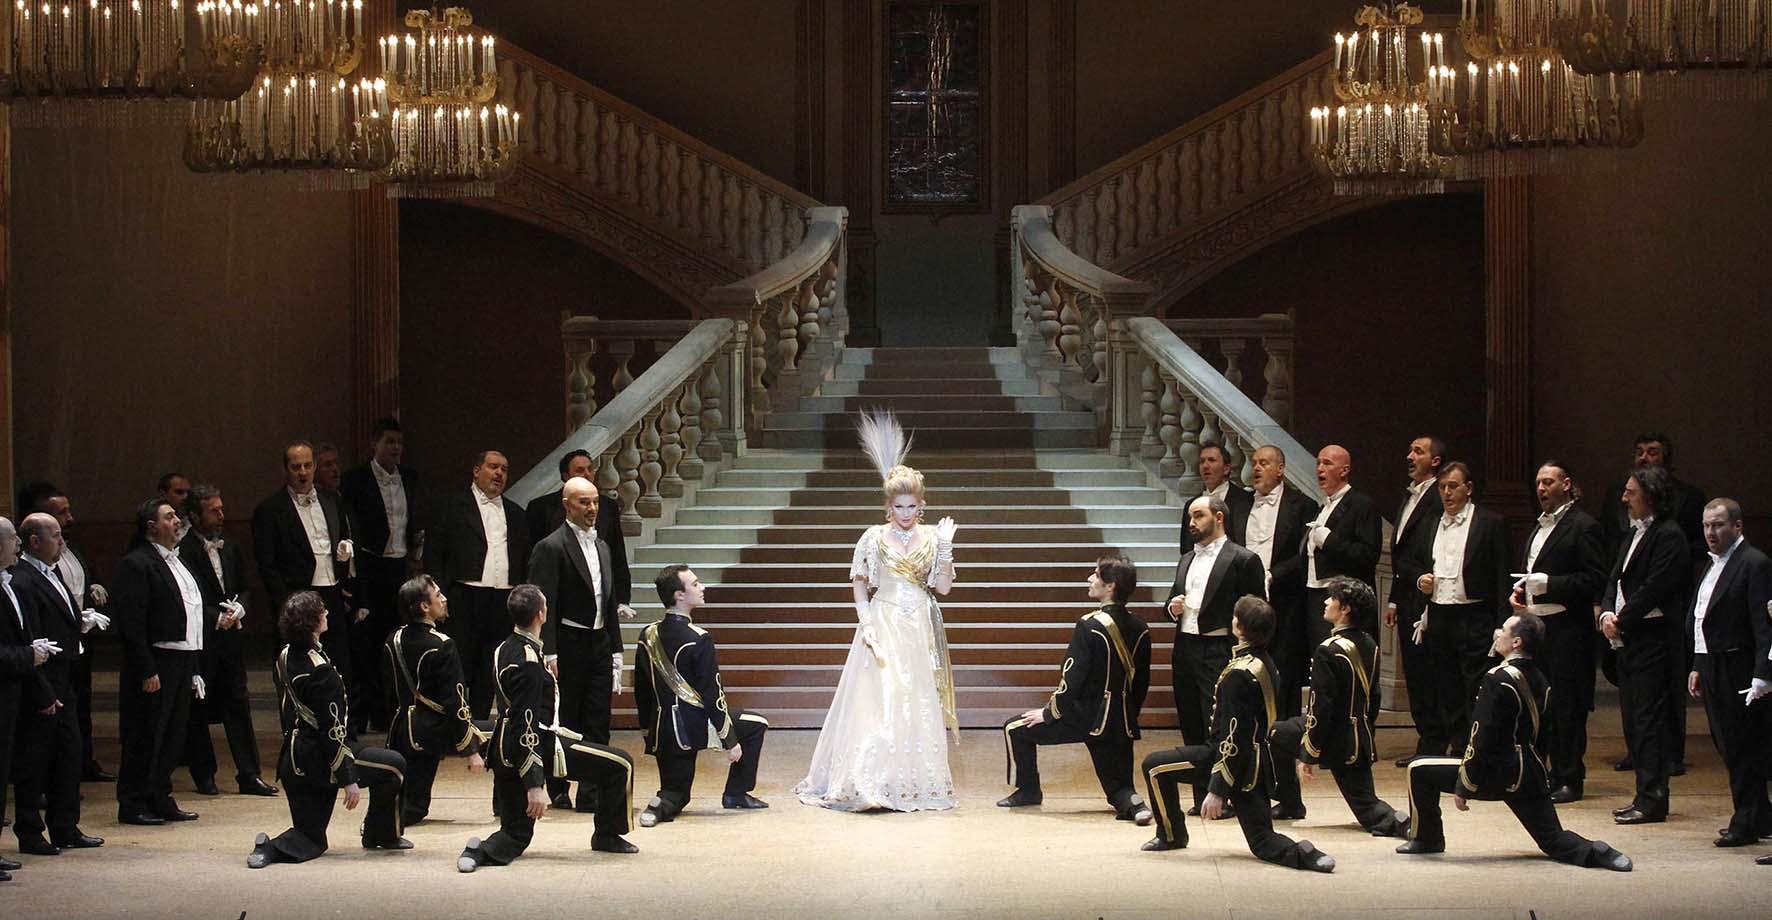 teatro Filarmonico stagione 2017 18 2014 La Vedova Allegra foto Ennevi 6433